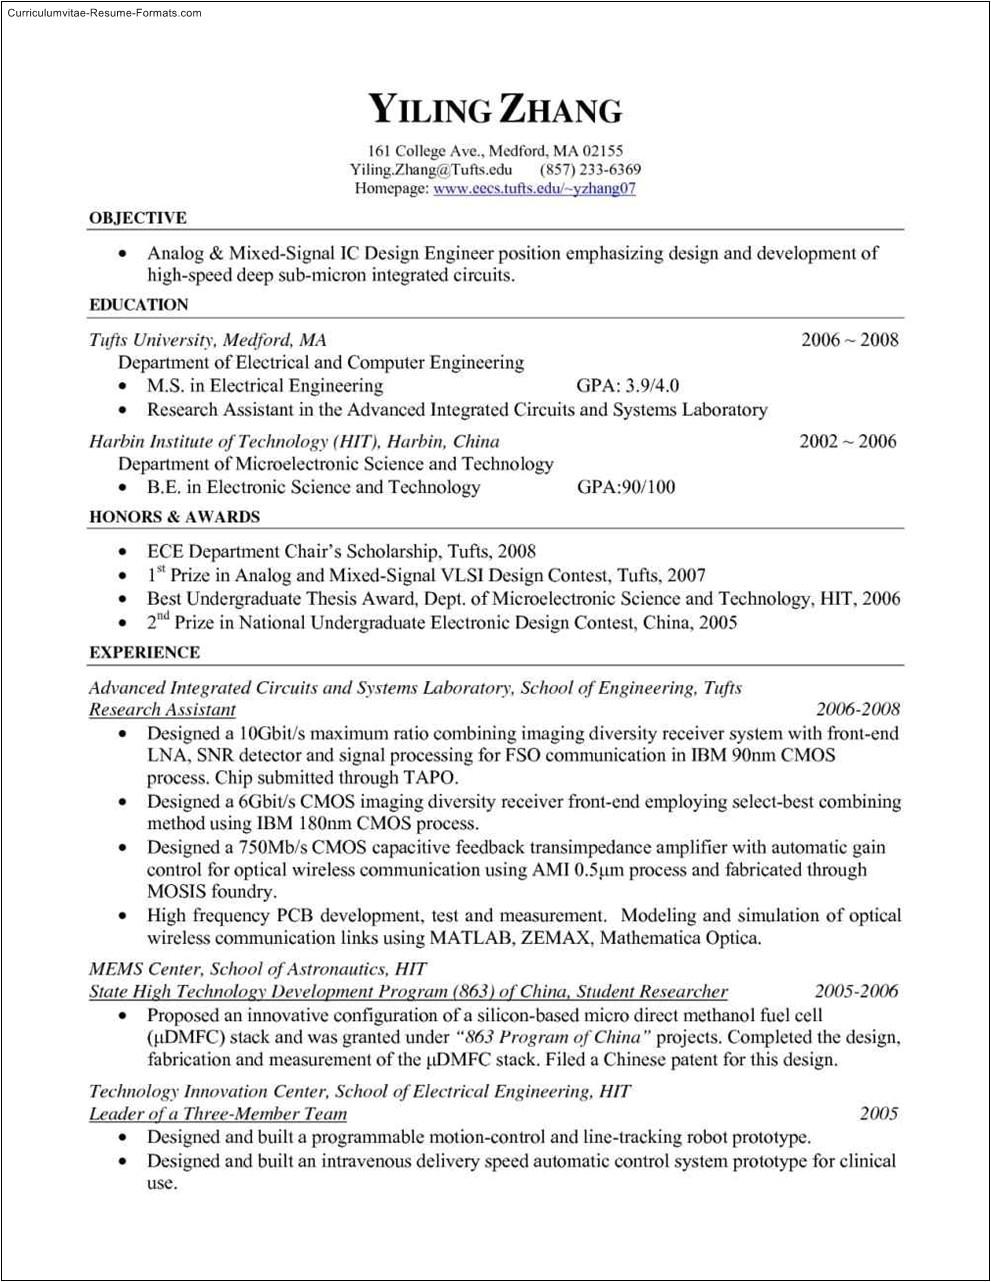 Resume Templates Pdf Free Free Resume Templates Pdf Free Samples Examples